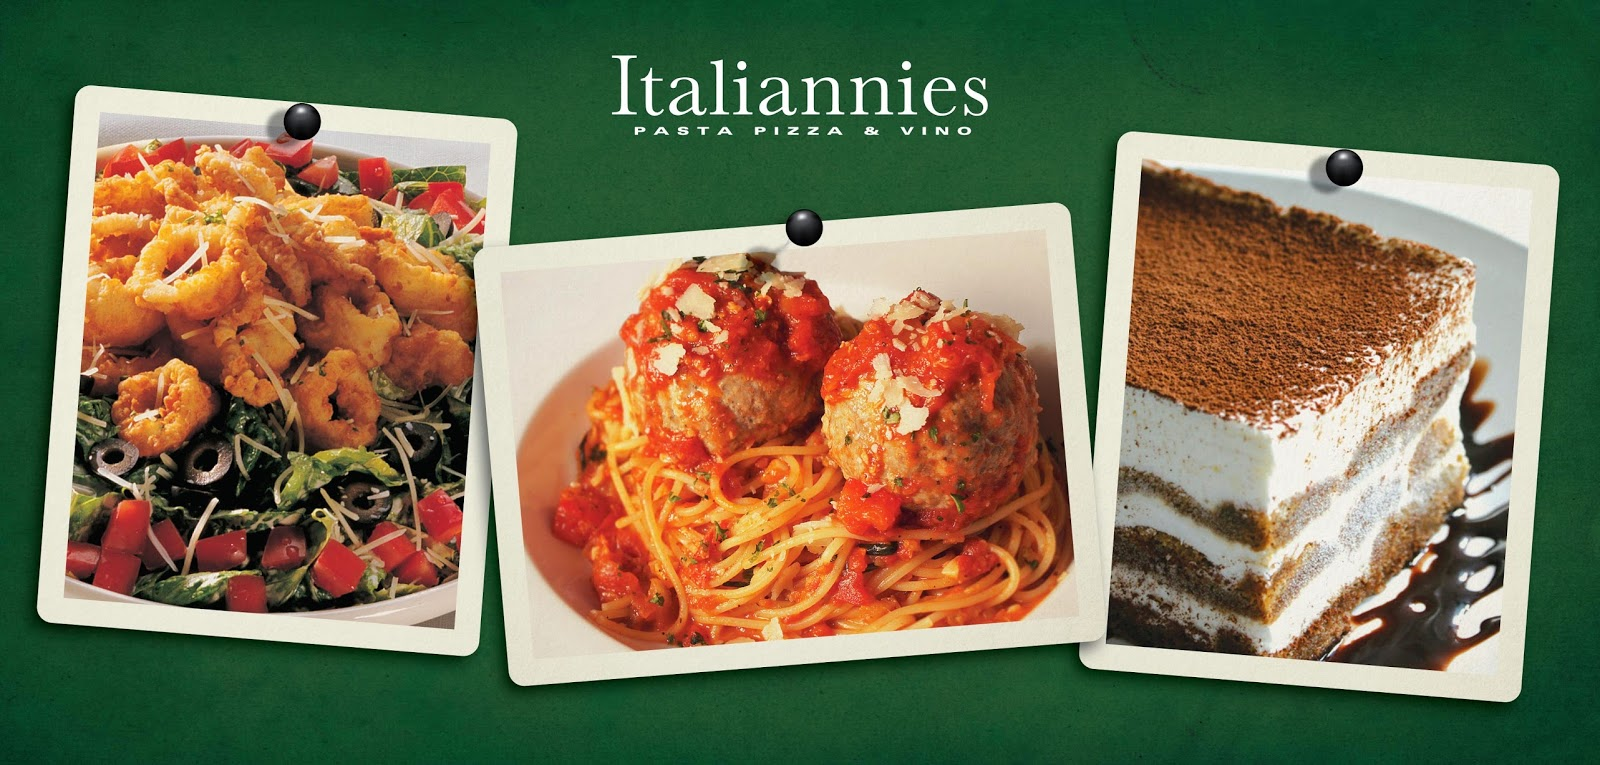 Calamari Caesar, Spaghetti & Meatball and also Tiramisu-  Italiannies Sundown Buffet